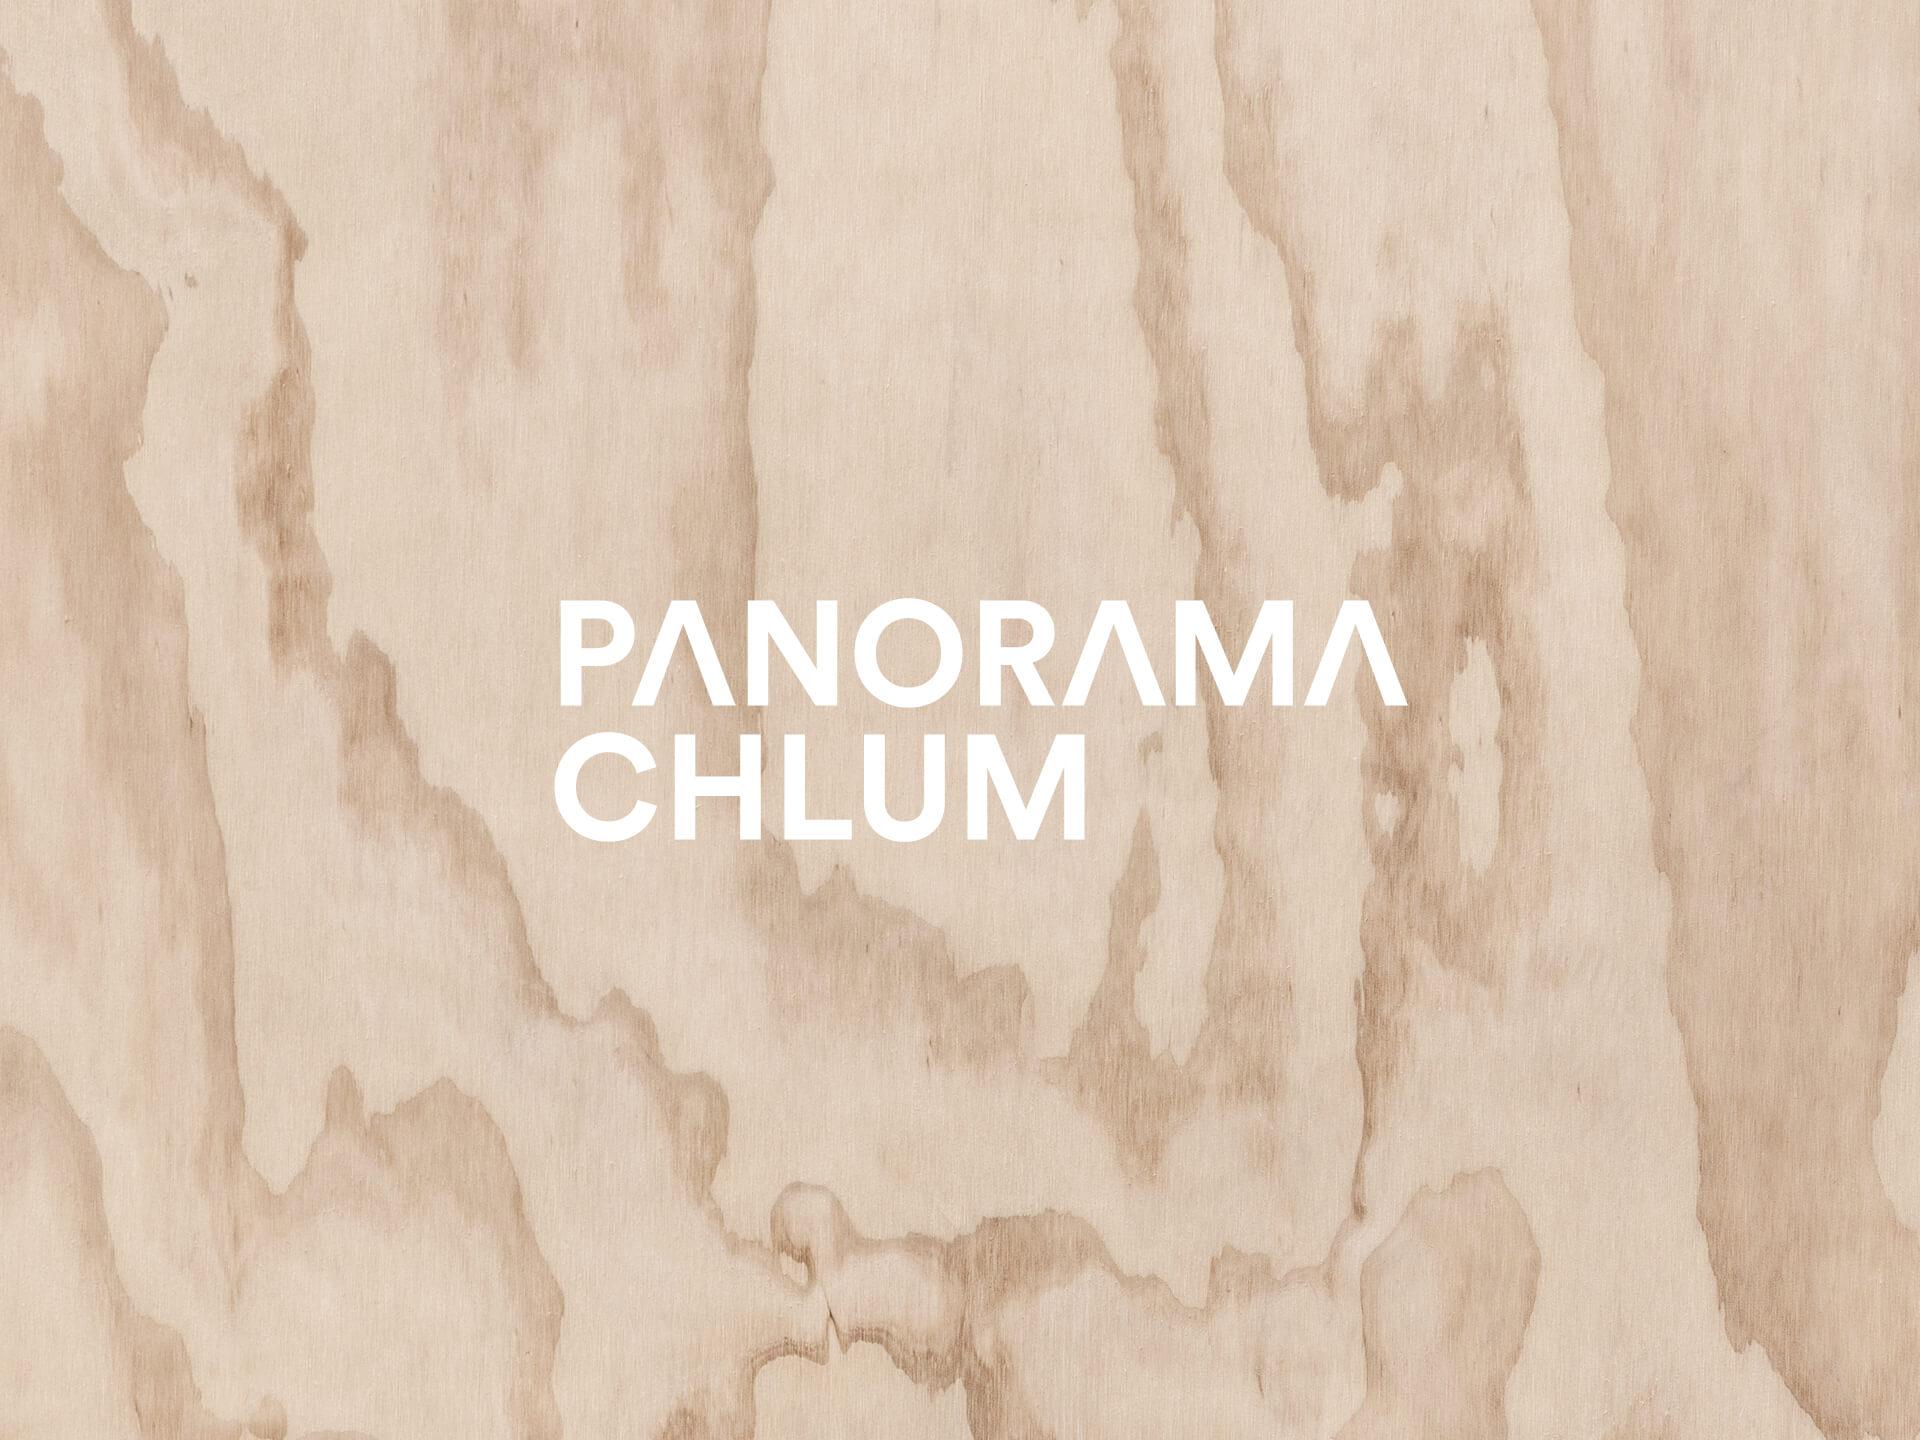 Panorama Chlum